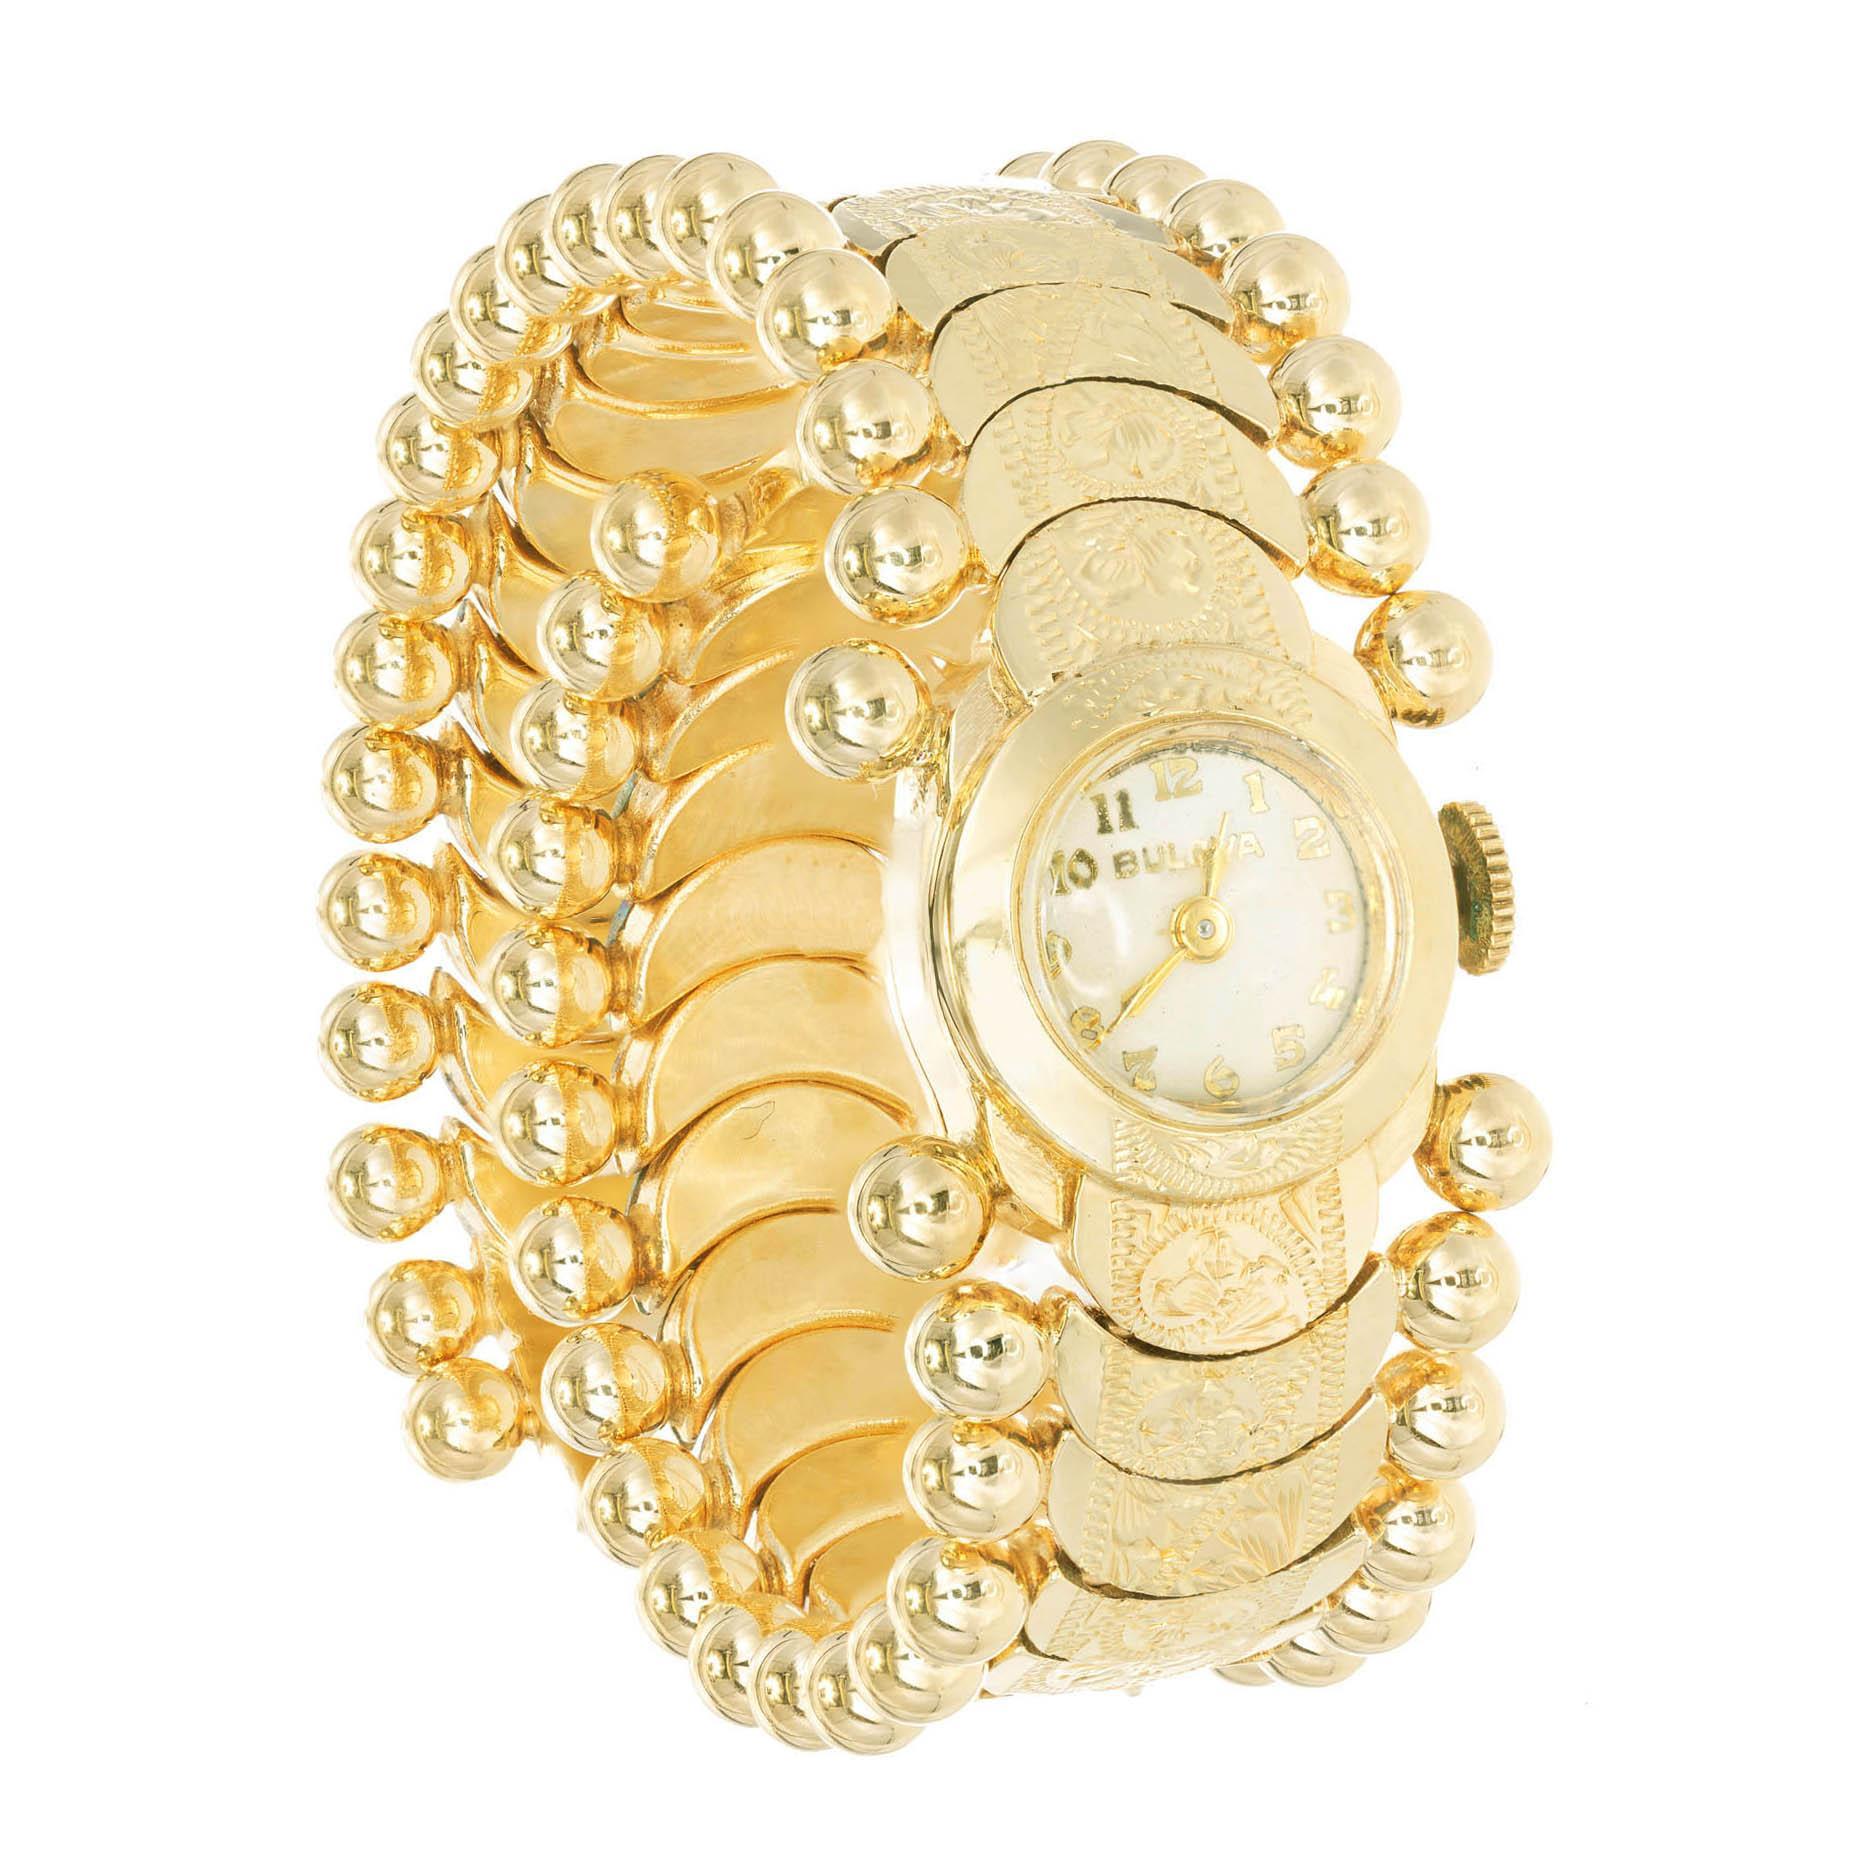 Bulova Ladies Yellow Gold Art Deco Manual Wind Wristwatch